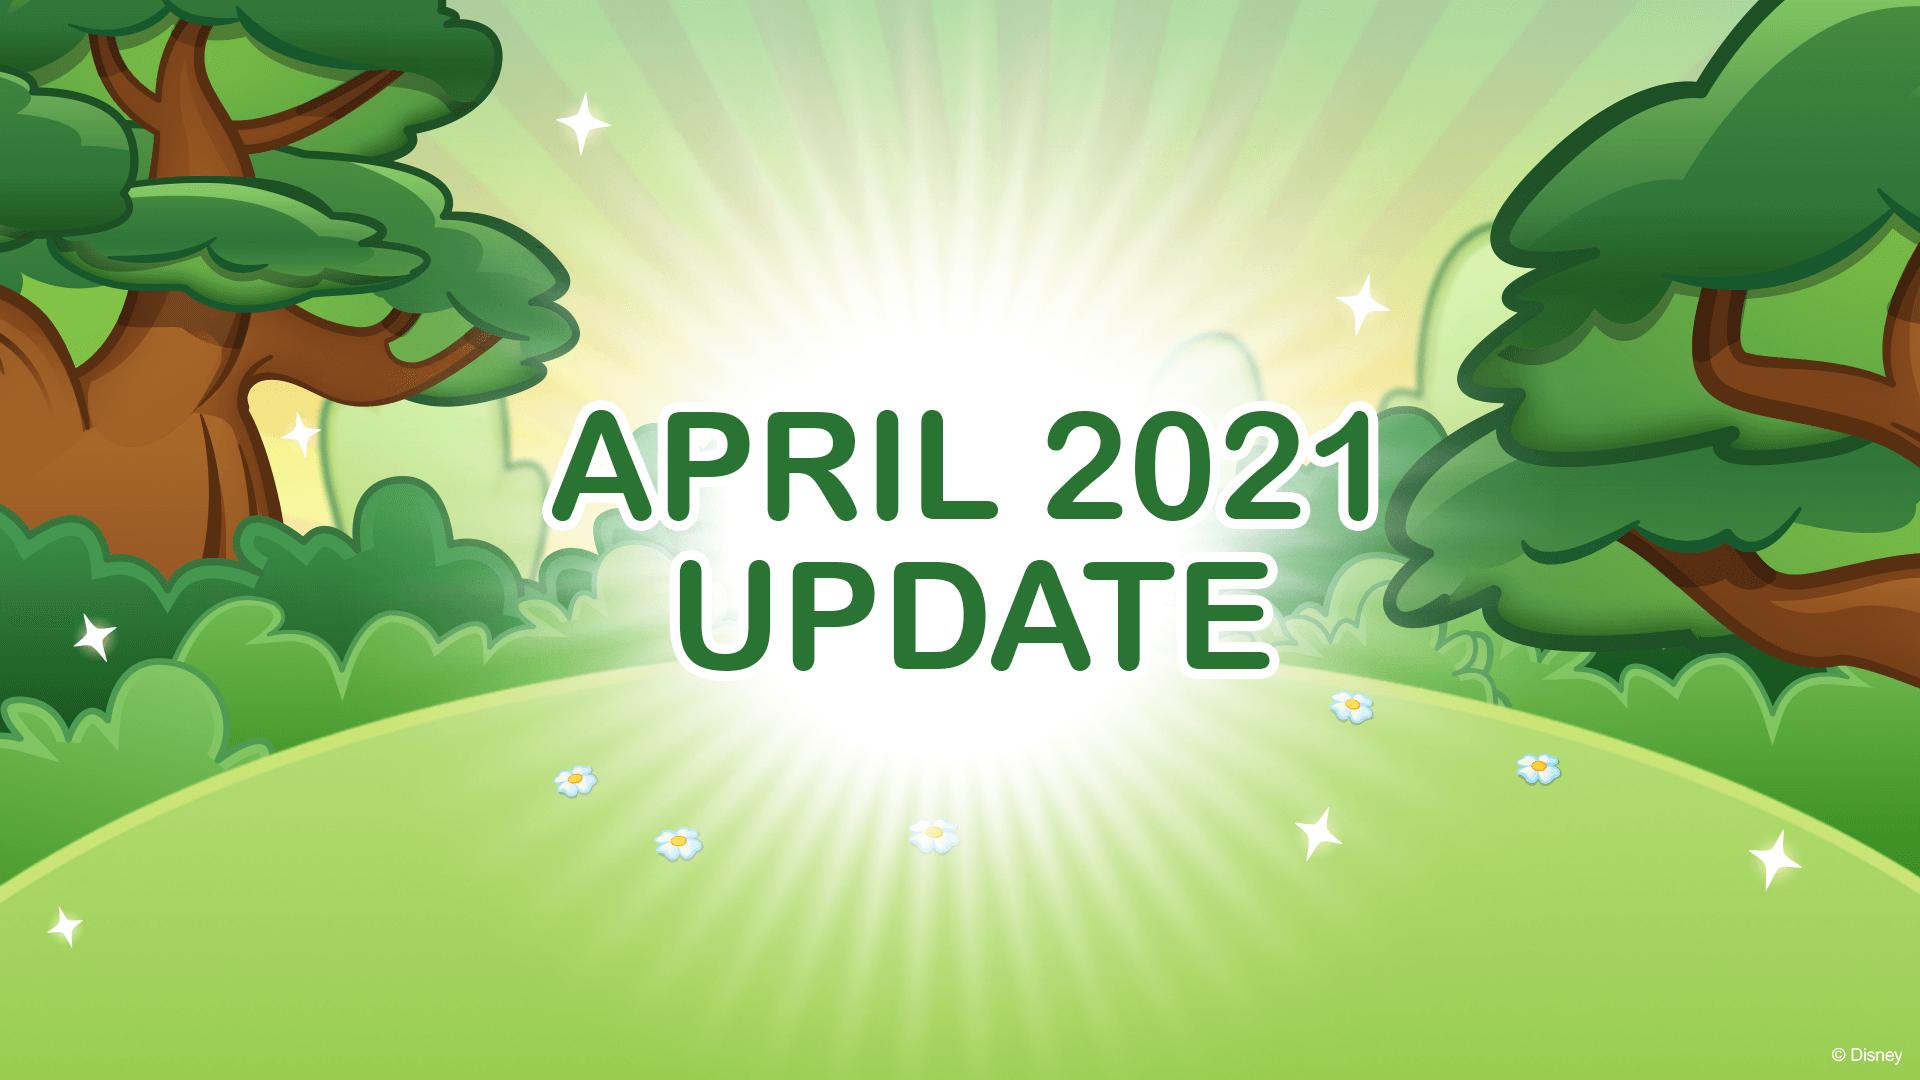 April 2021 Update in Disney Emoji Blitz